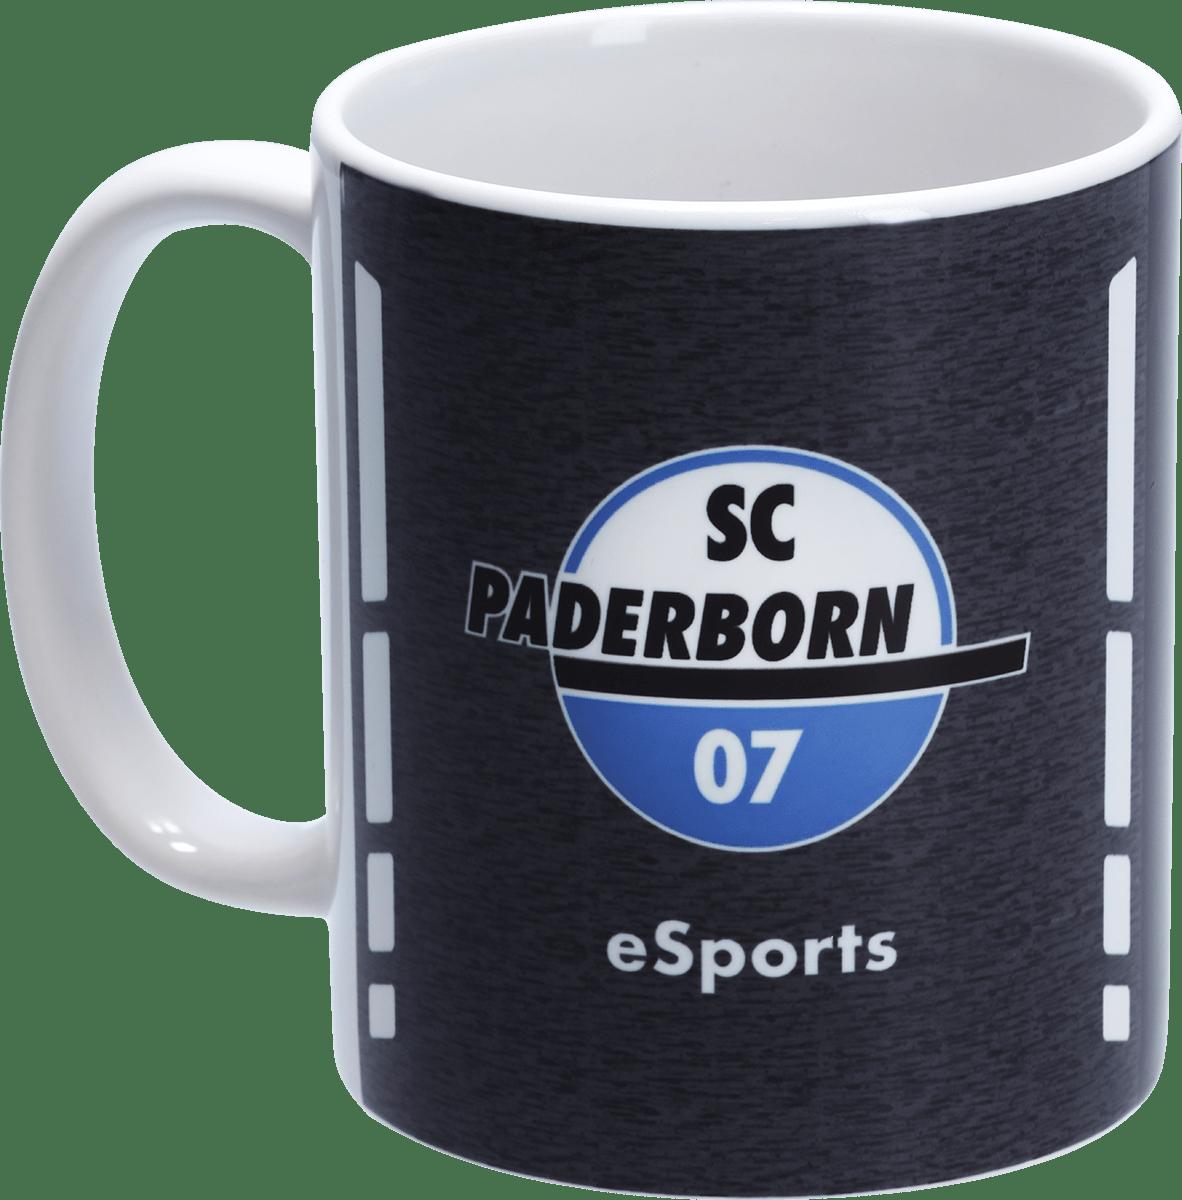 Personalisierbare Tasse eSports-Trikot 20/21